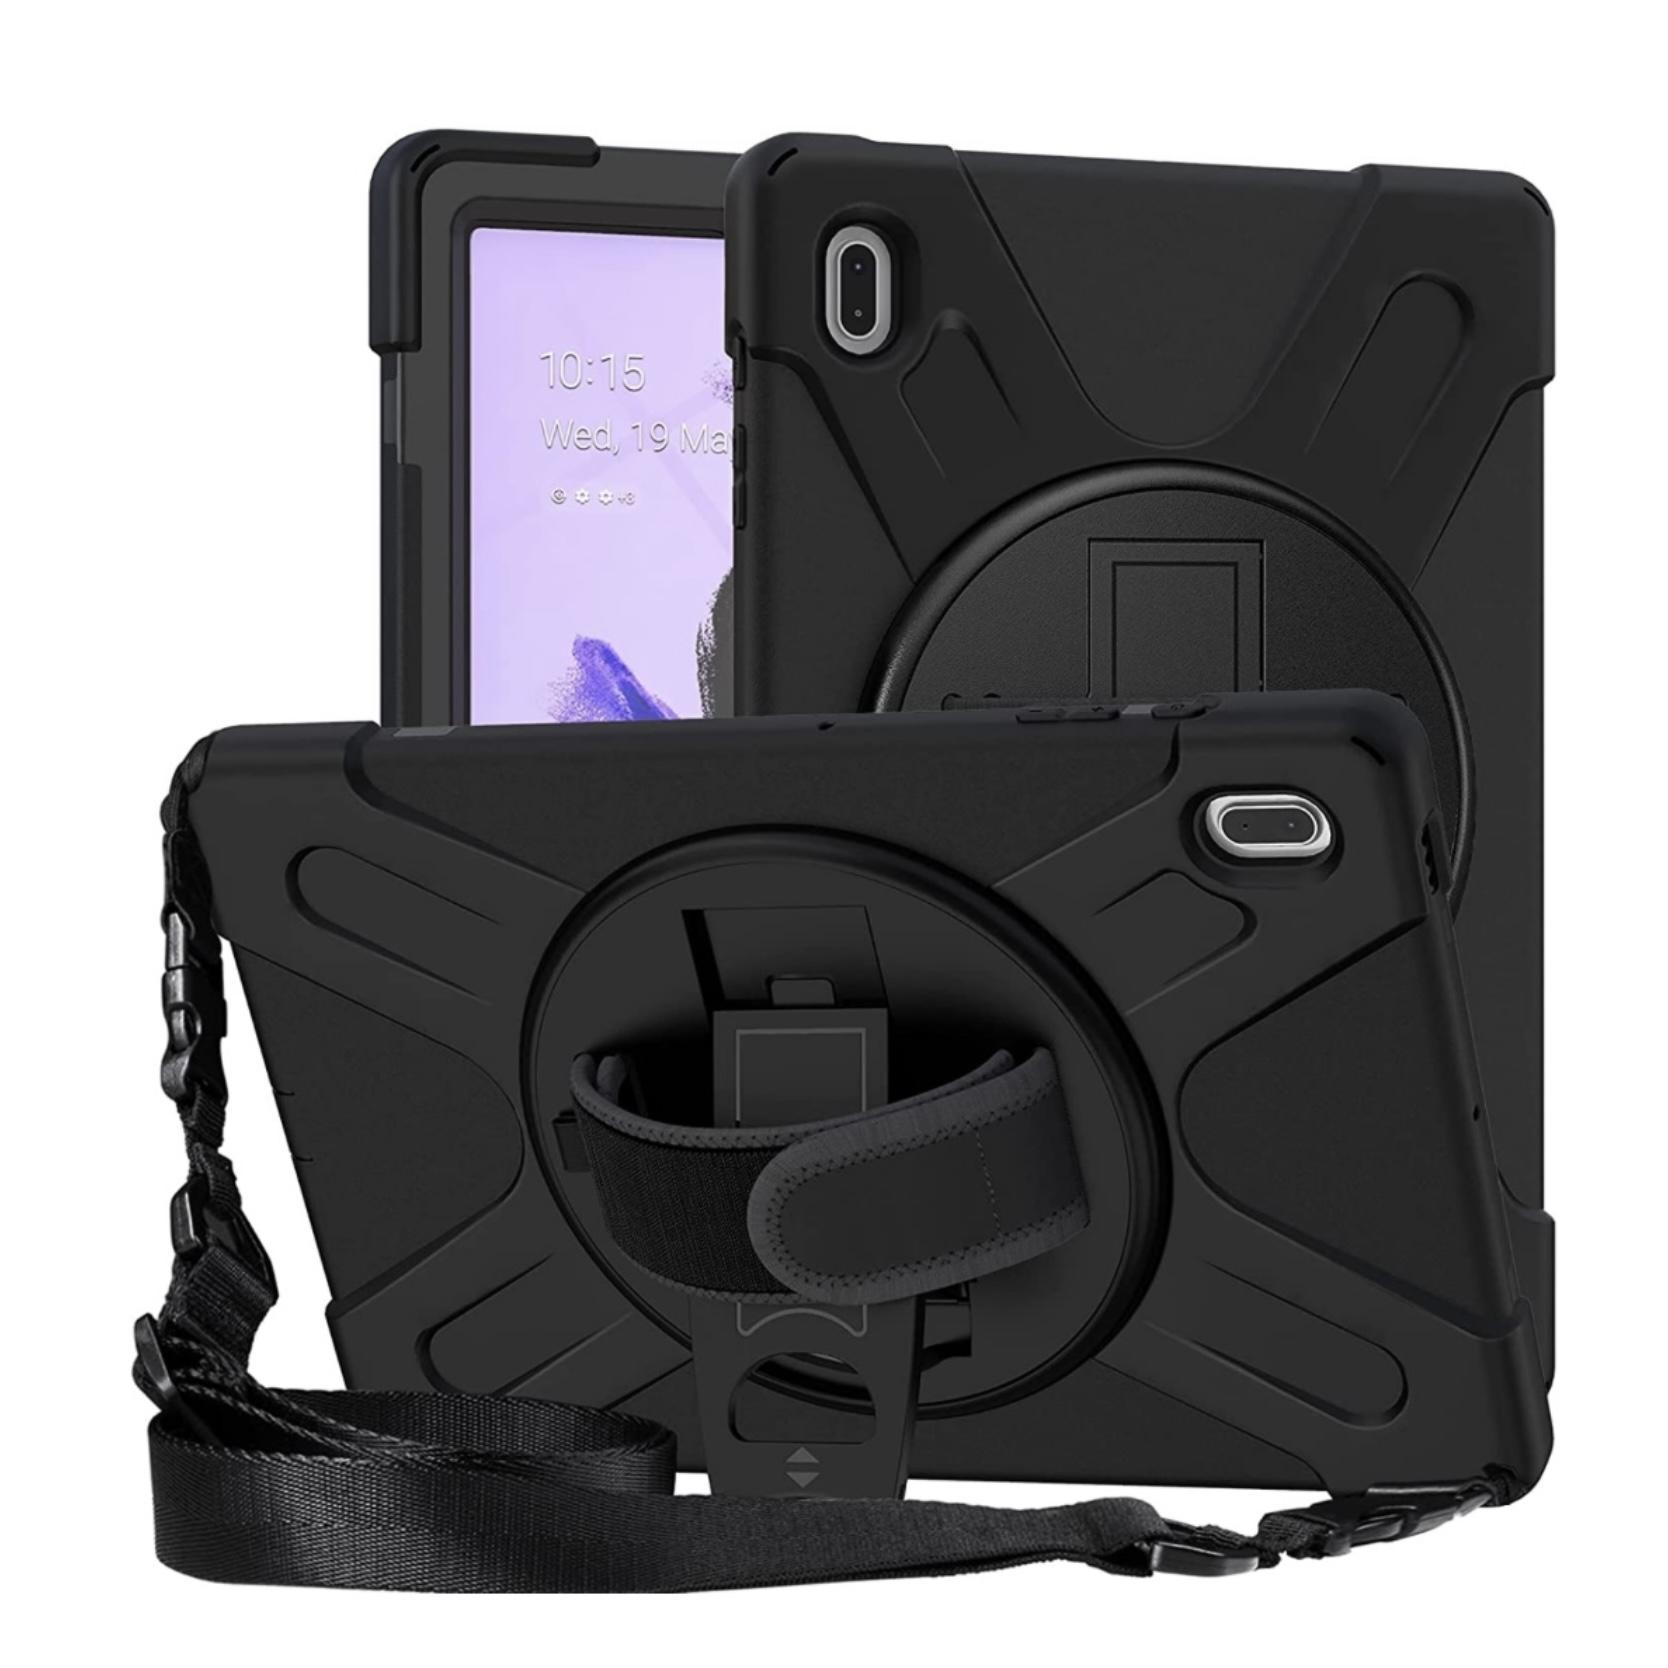 REF 2592 Pack 2 en 1 Coque de protection Vancouver et Verre ecran Galaxy TAB S7 FE 12.4 pouces